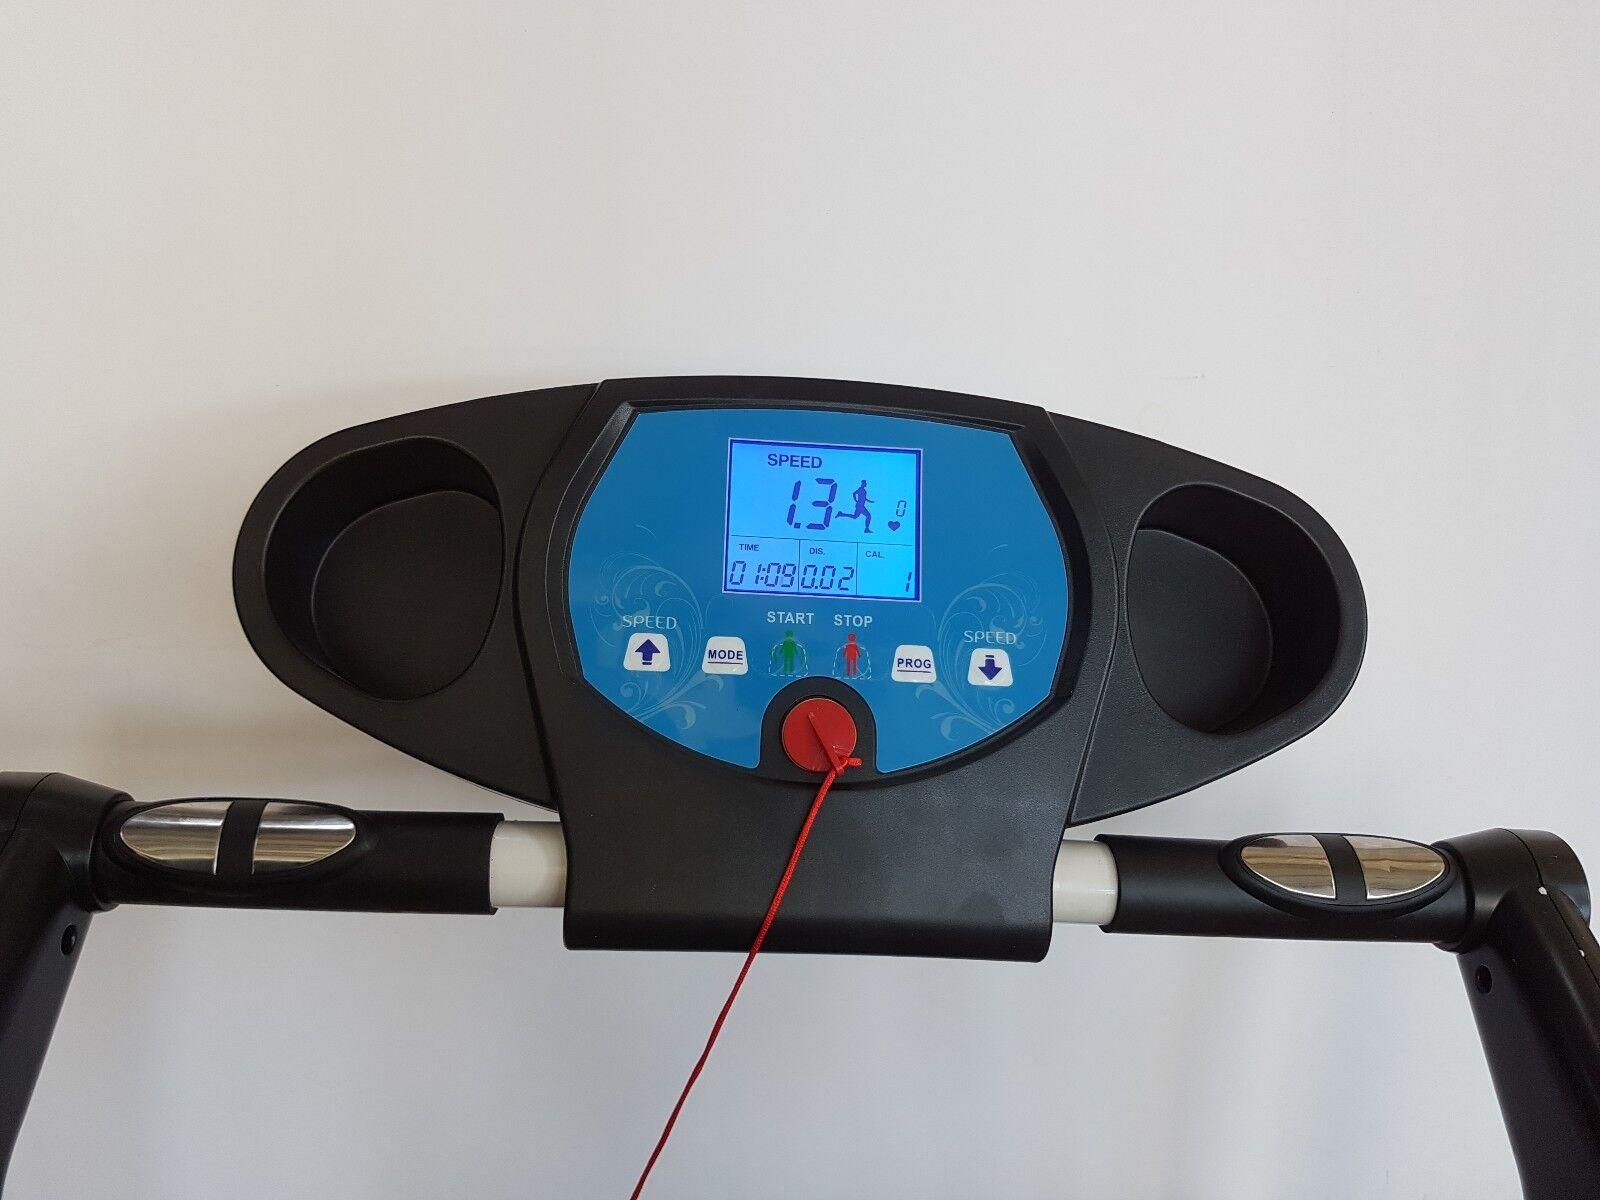 koolook tapis roulant elettric... Image 3